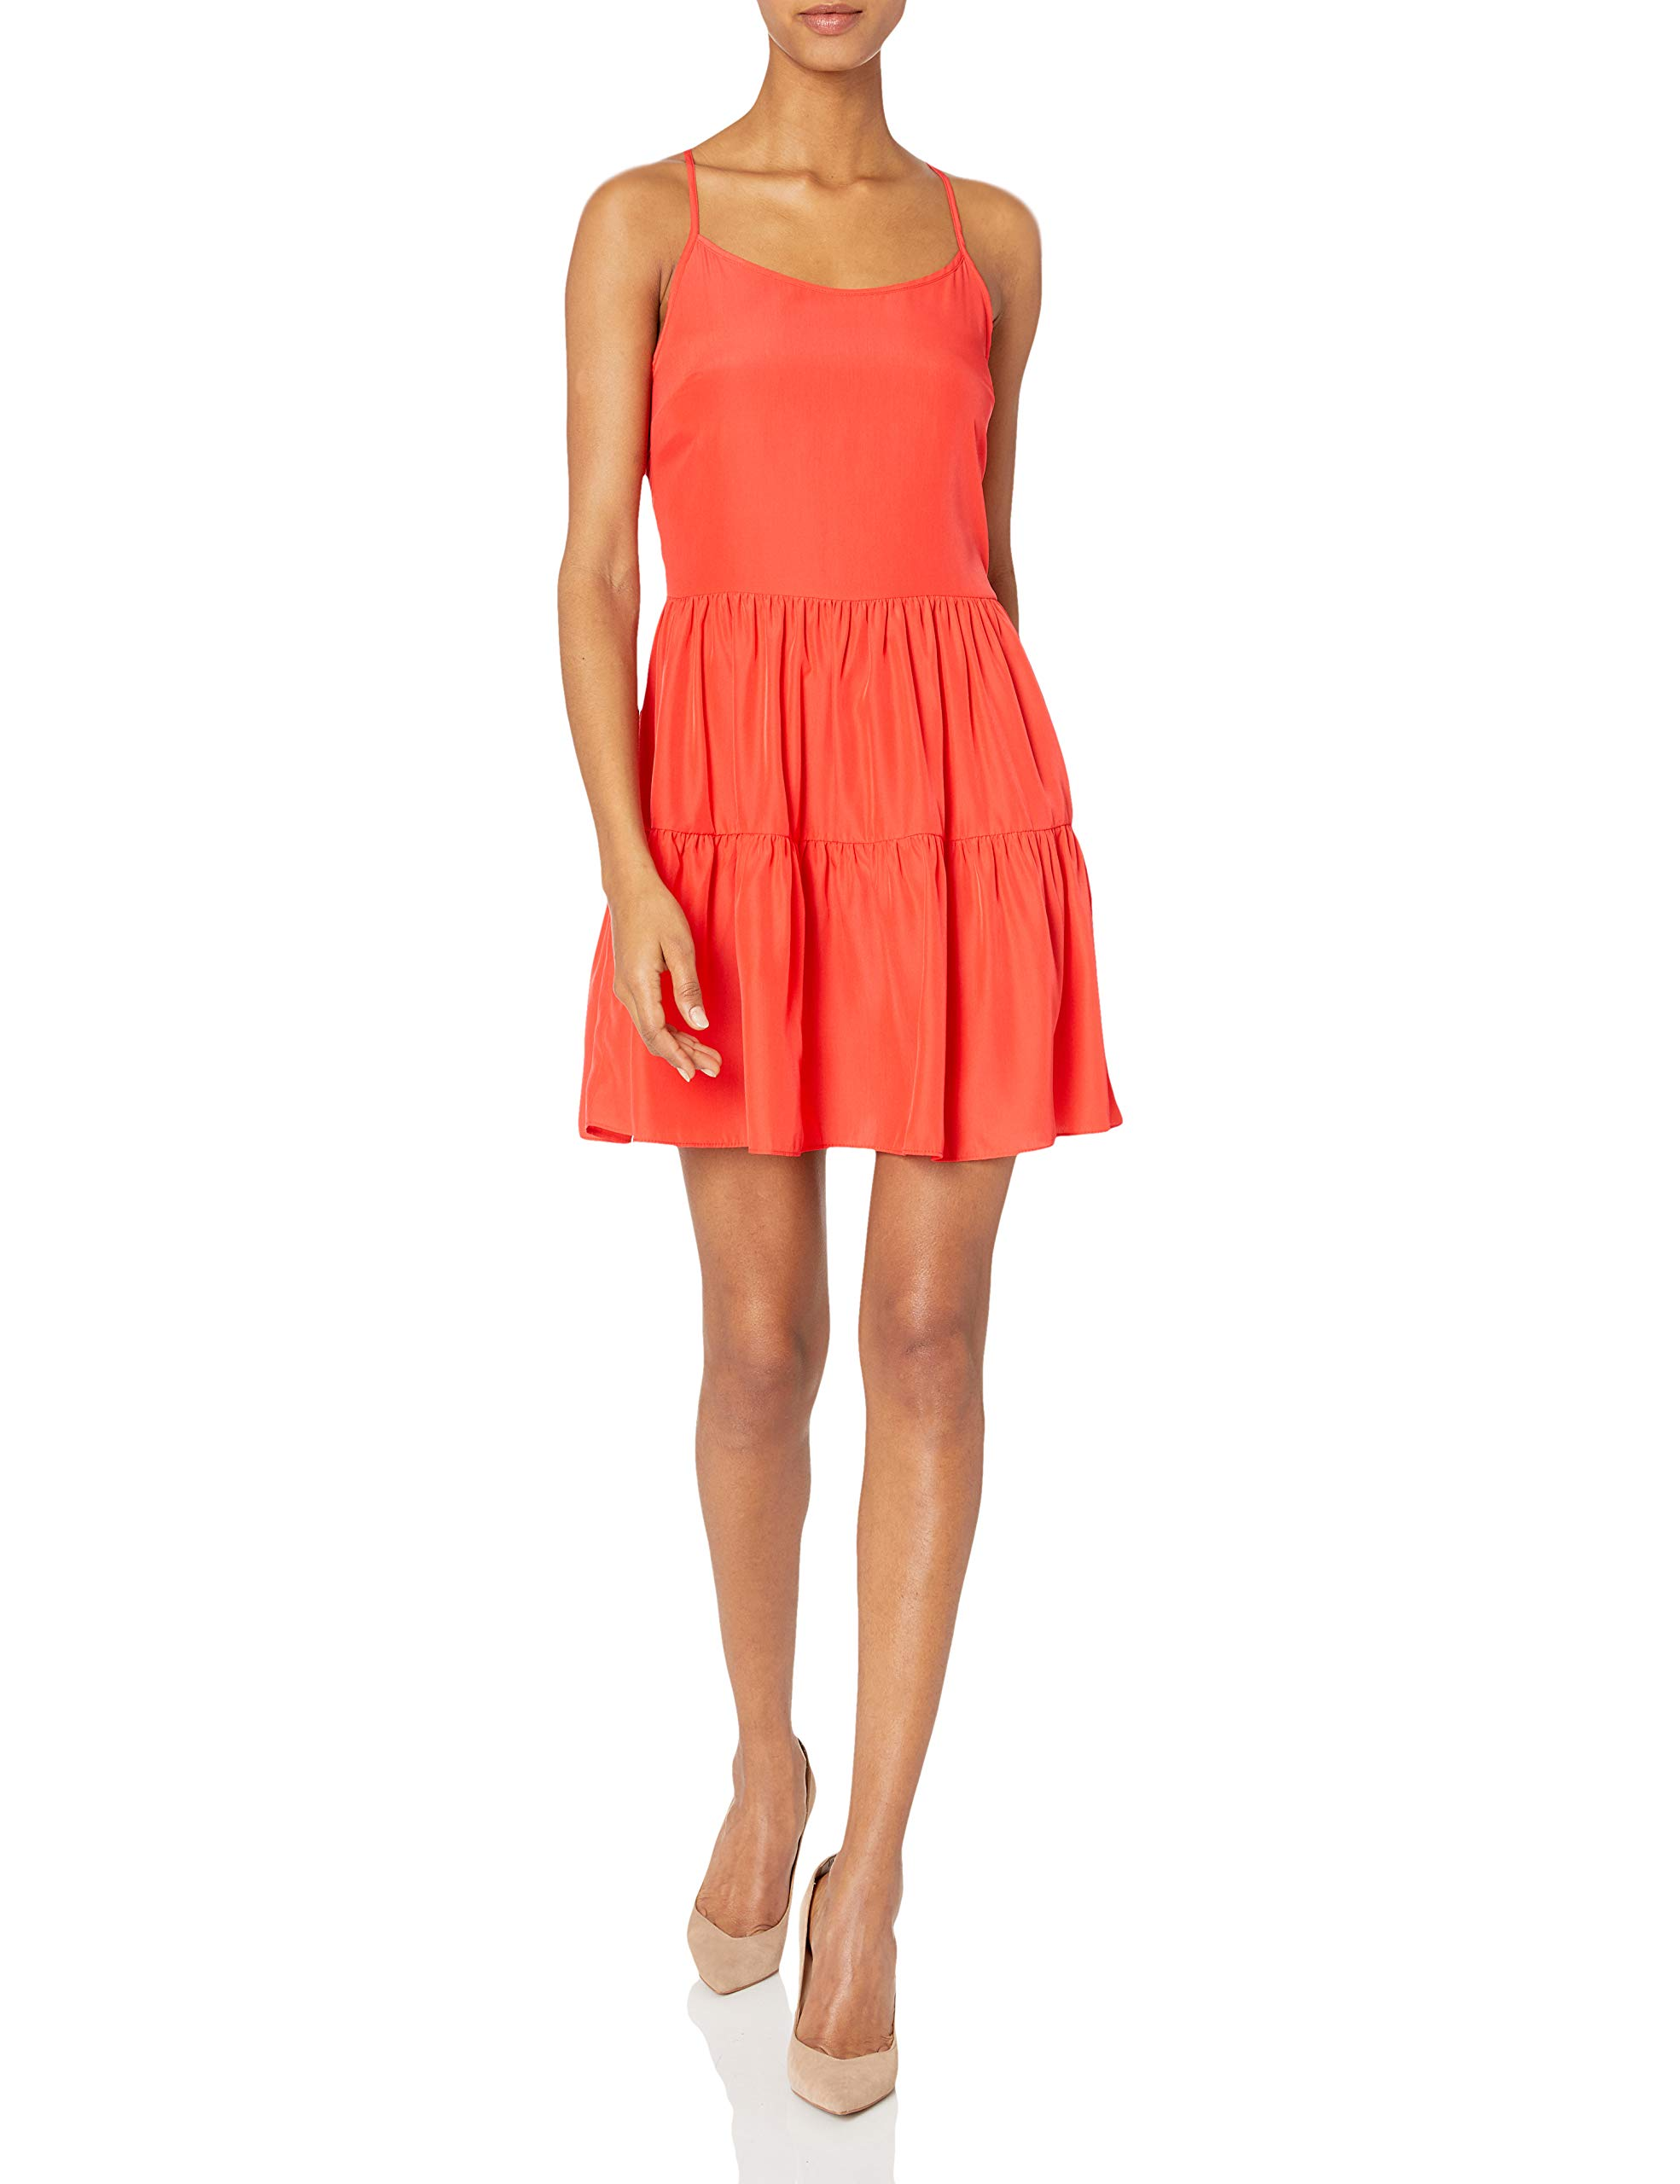 Available at Amazon: Amanda Uprichard A Women's Del Mar Bandana Print Dress